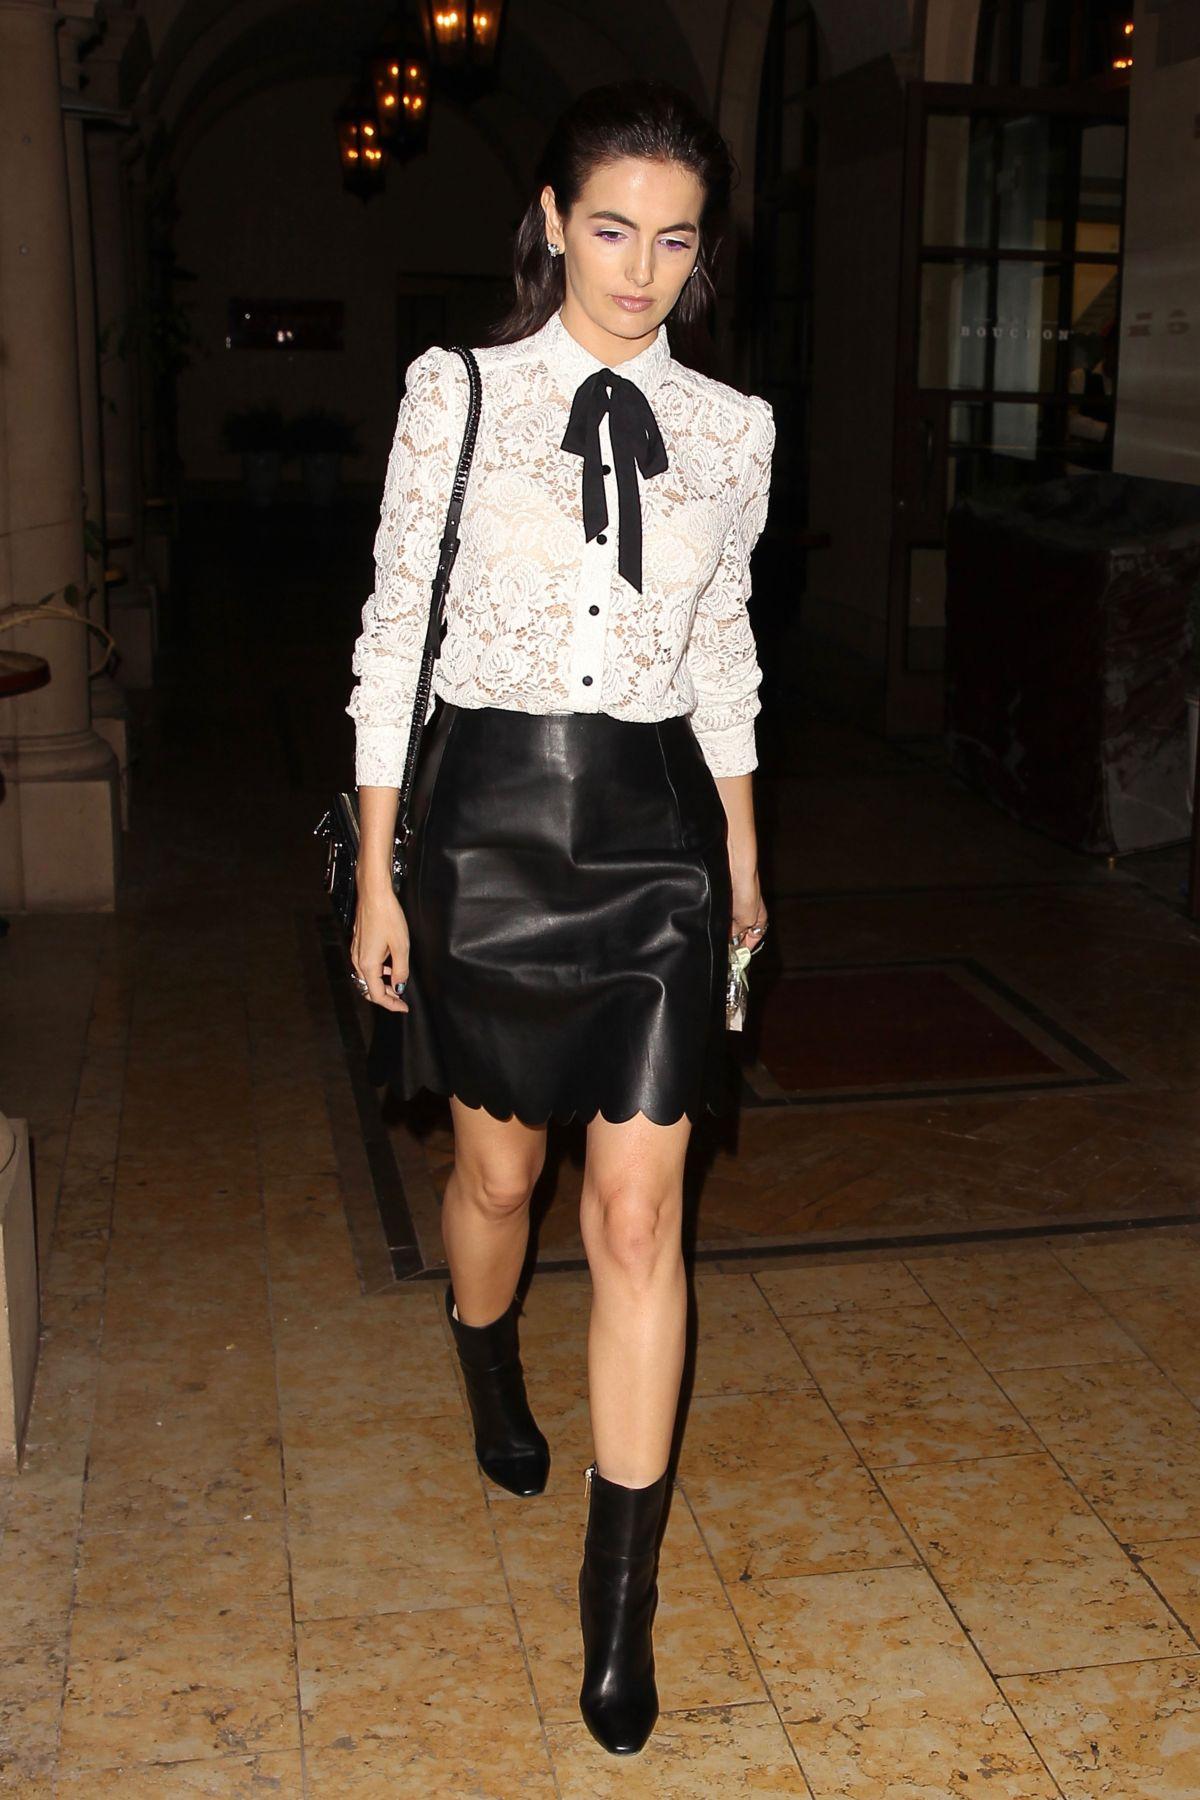 Camilla belle at cfda vogue fashion fund fashion show in los angeles